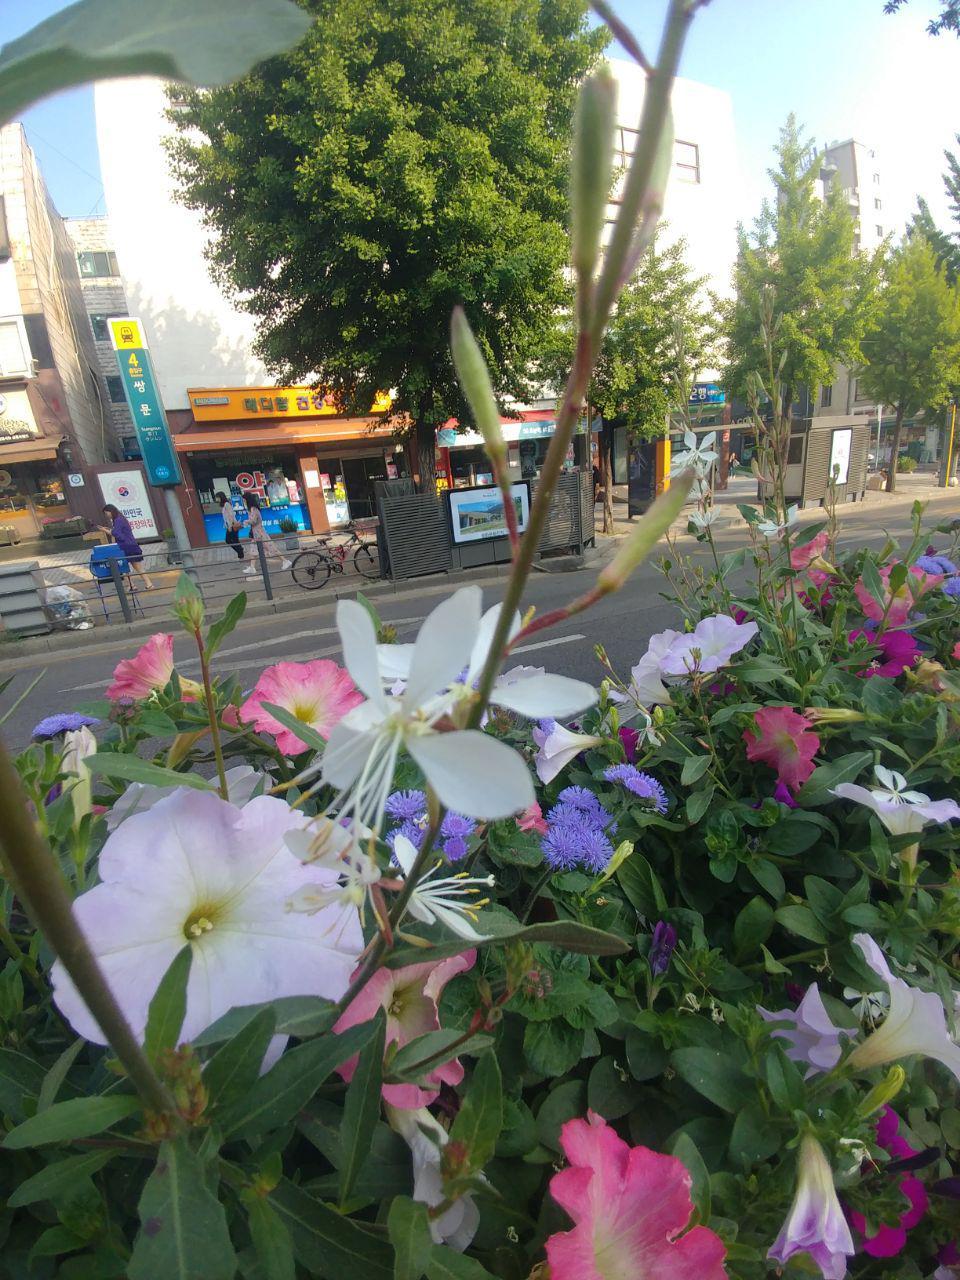 photo_2019-05-19_21-14-28.jpg